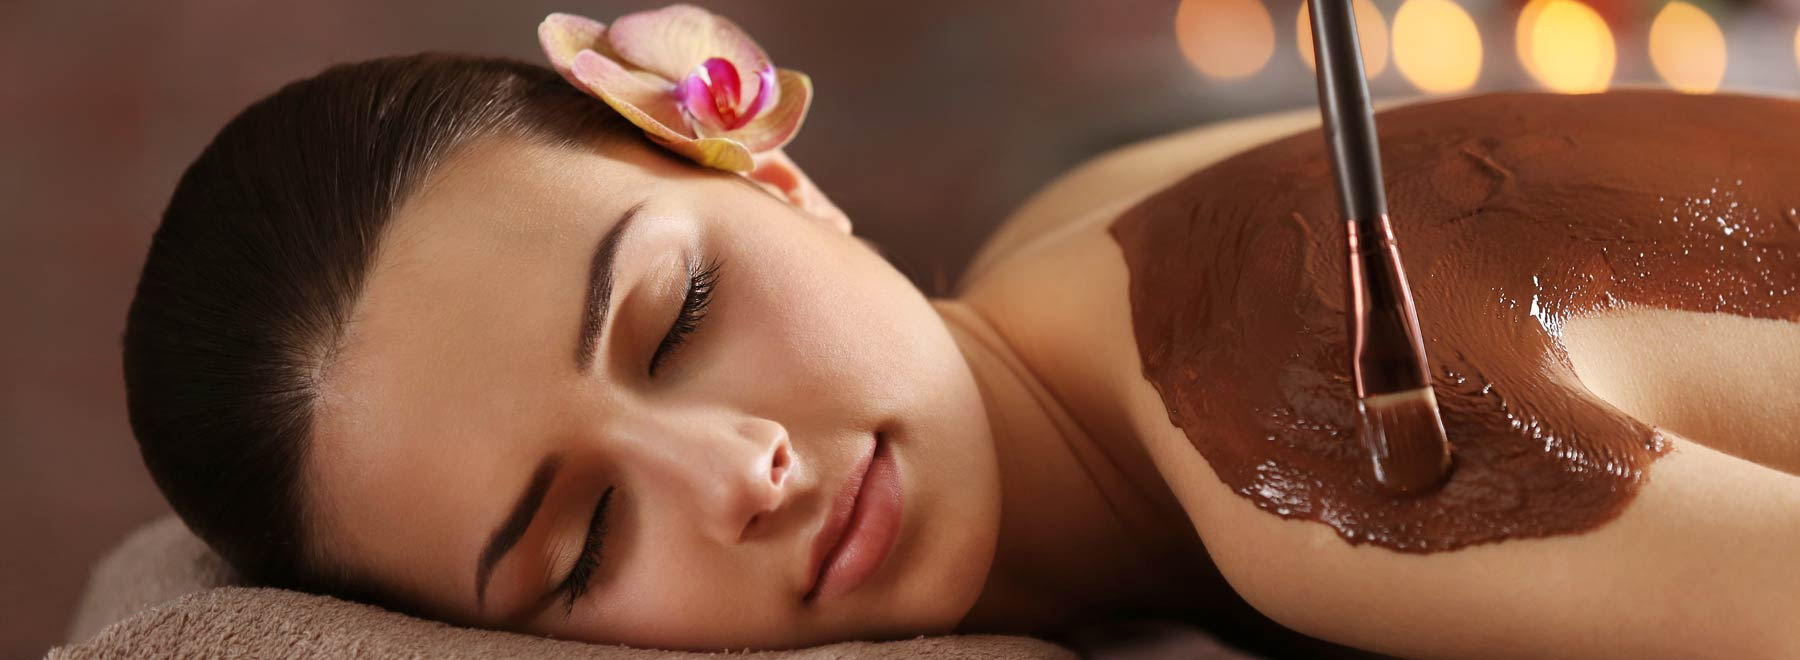 7.Chocolate Massage